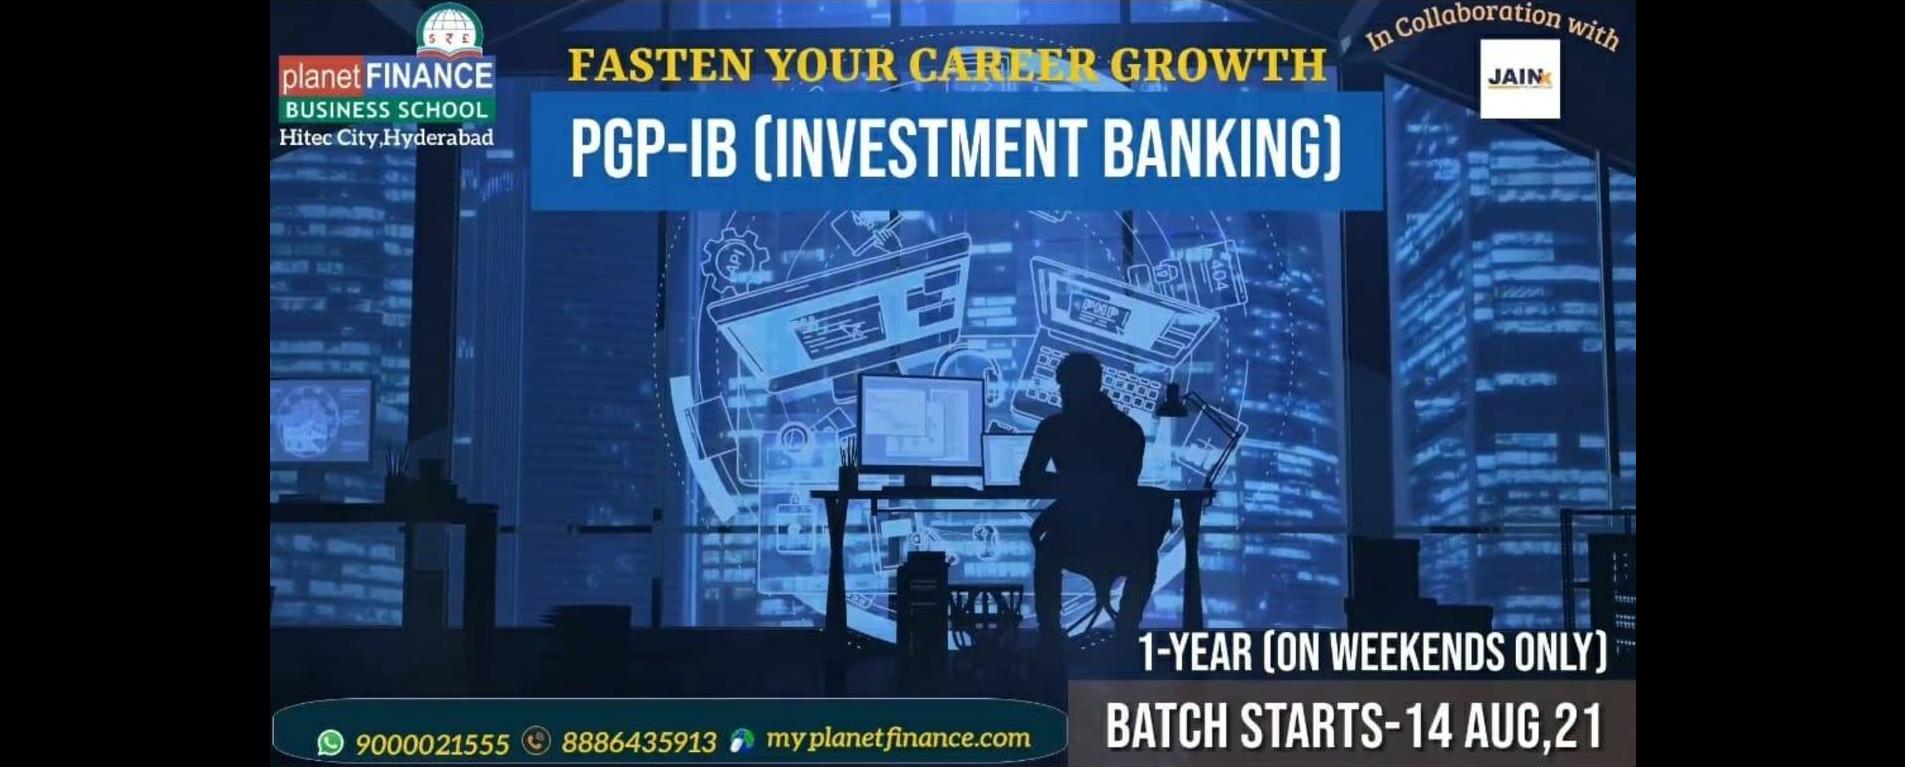 Planet Finance - Educational Institution in Sanjeeva Reddy Nagar, Hyderabad